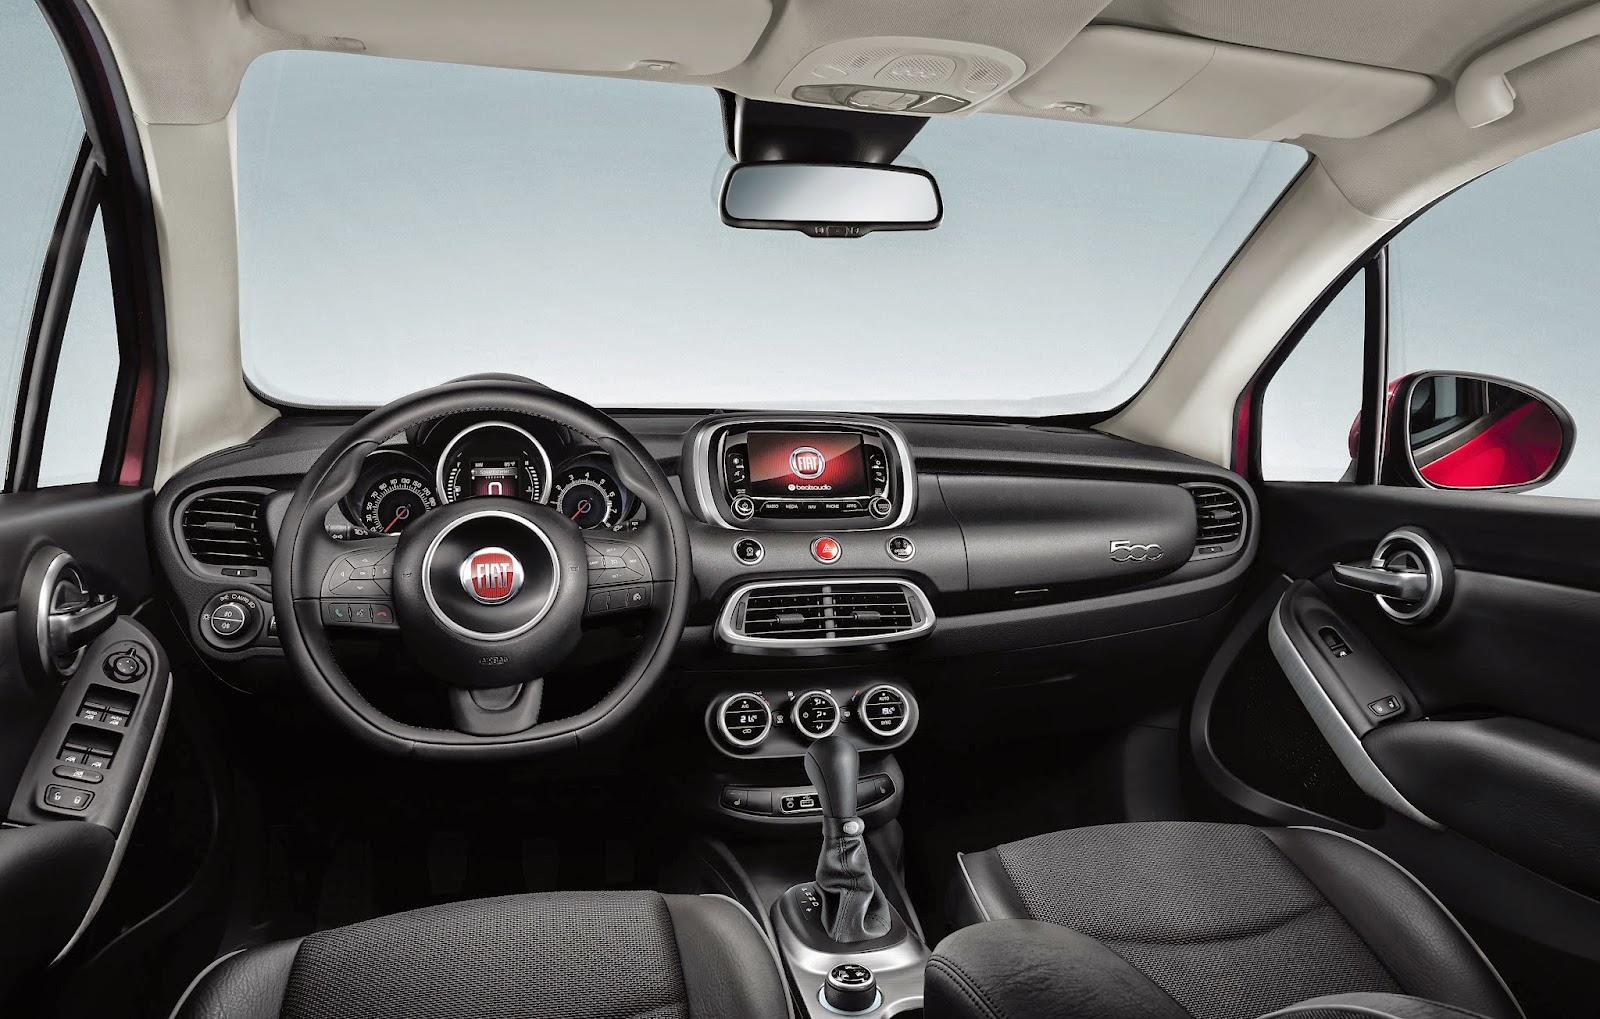 Fantechnology Anteprima Mondiale Del Nuovo Crossover Fiat